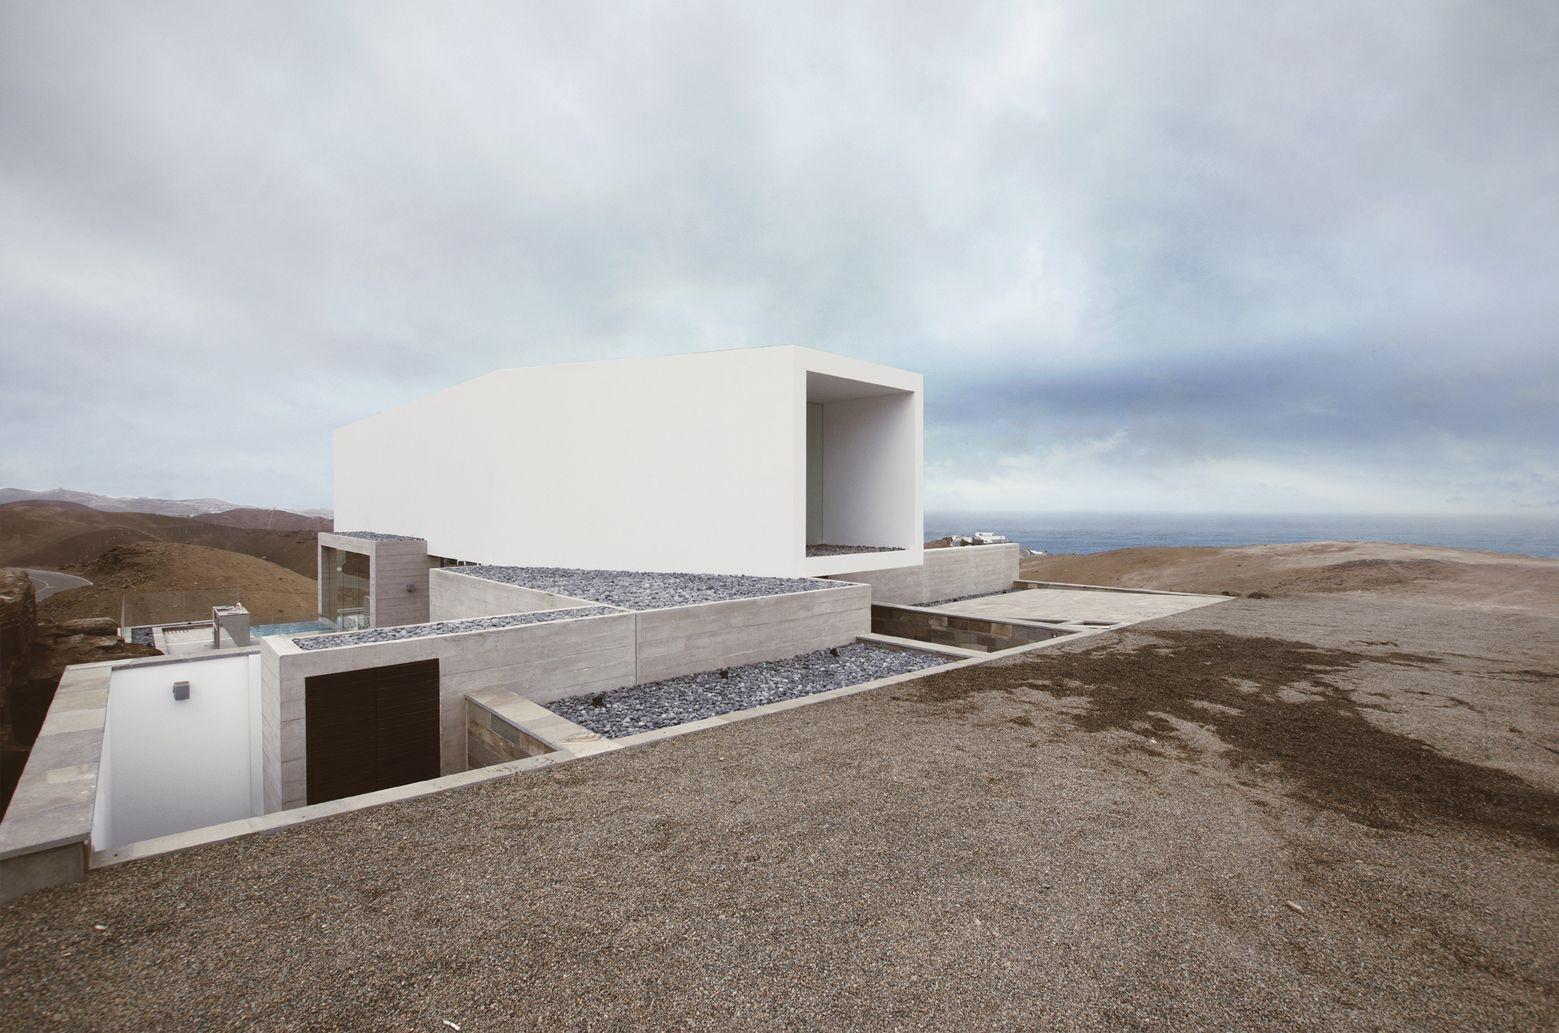 Gallery of P2 House Poseidon / Domenack arquitectos - 1 ...